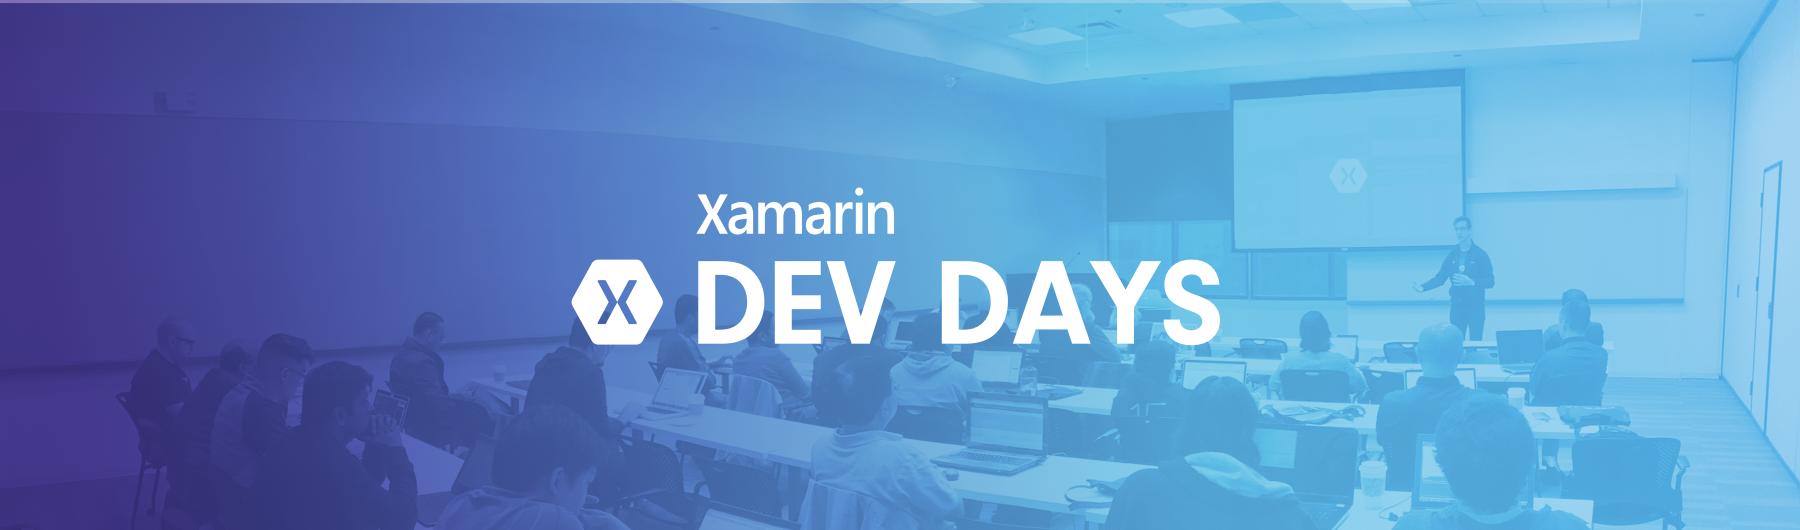 Xamarin Dev Days - Lima